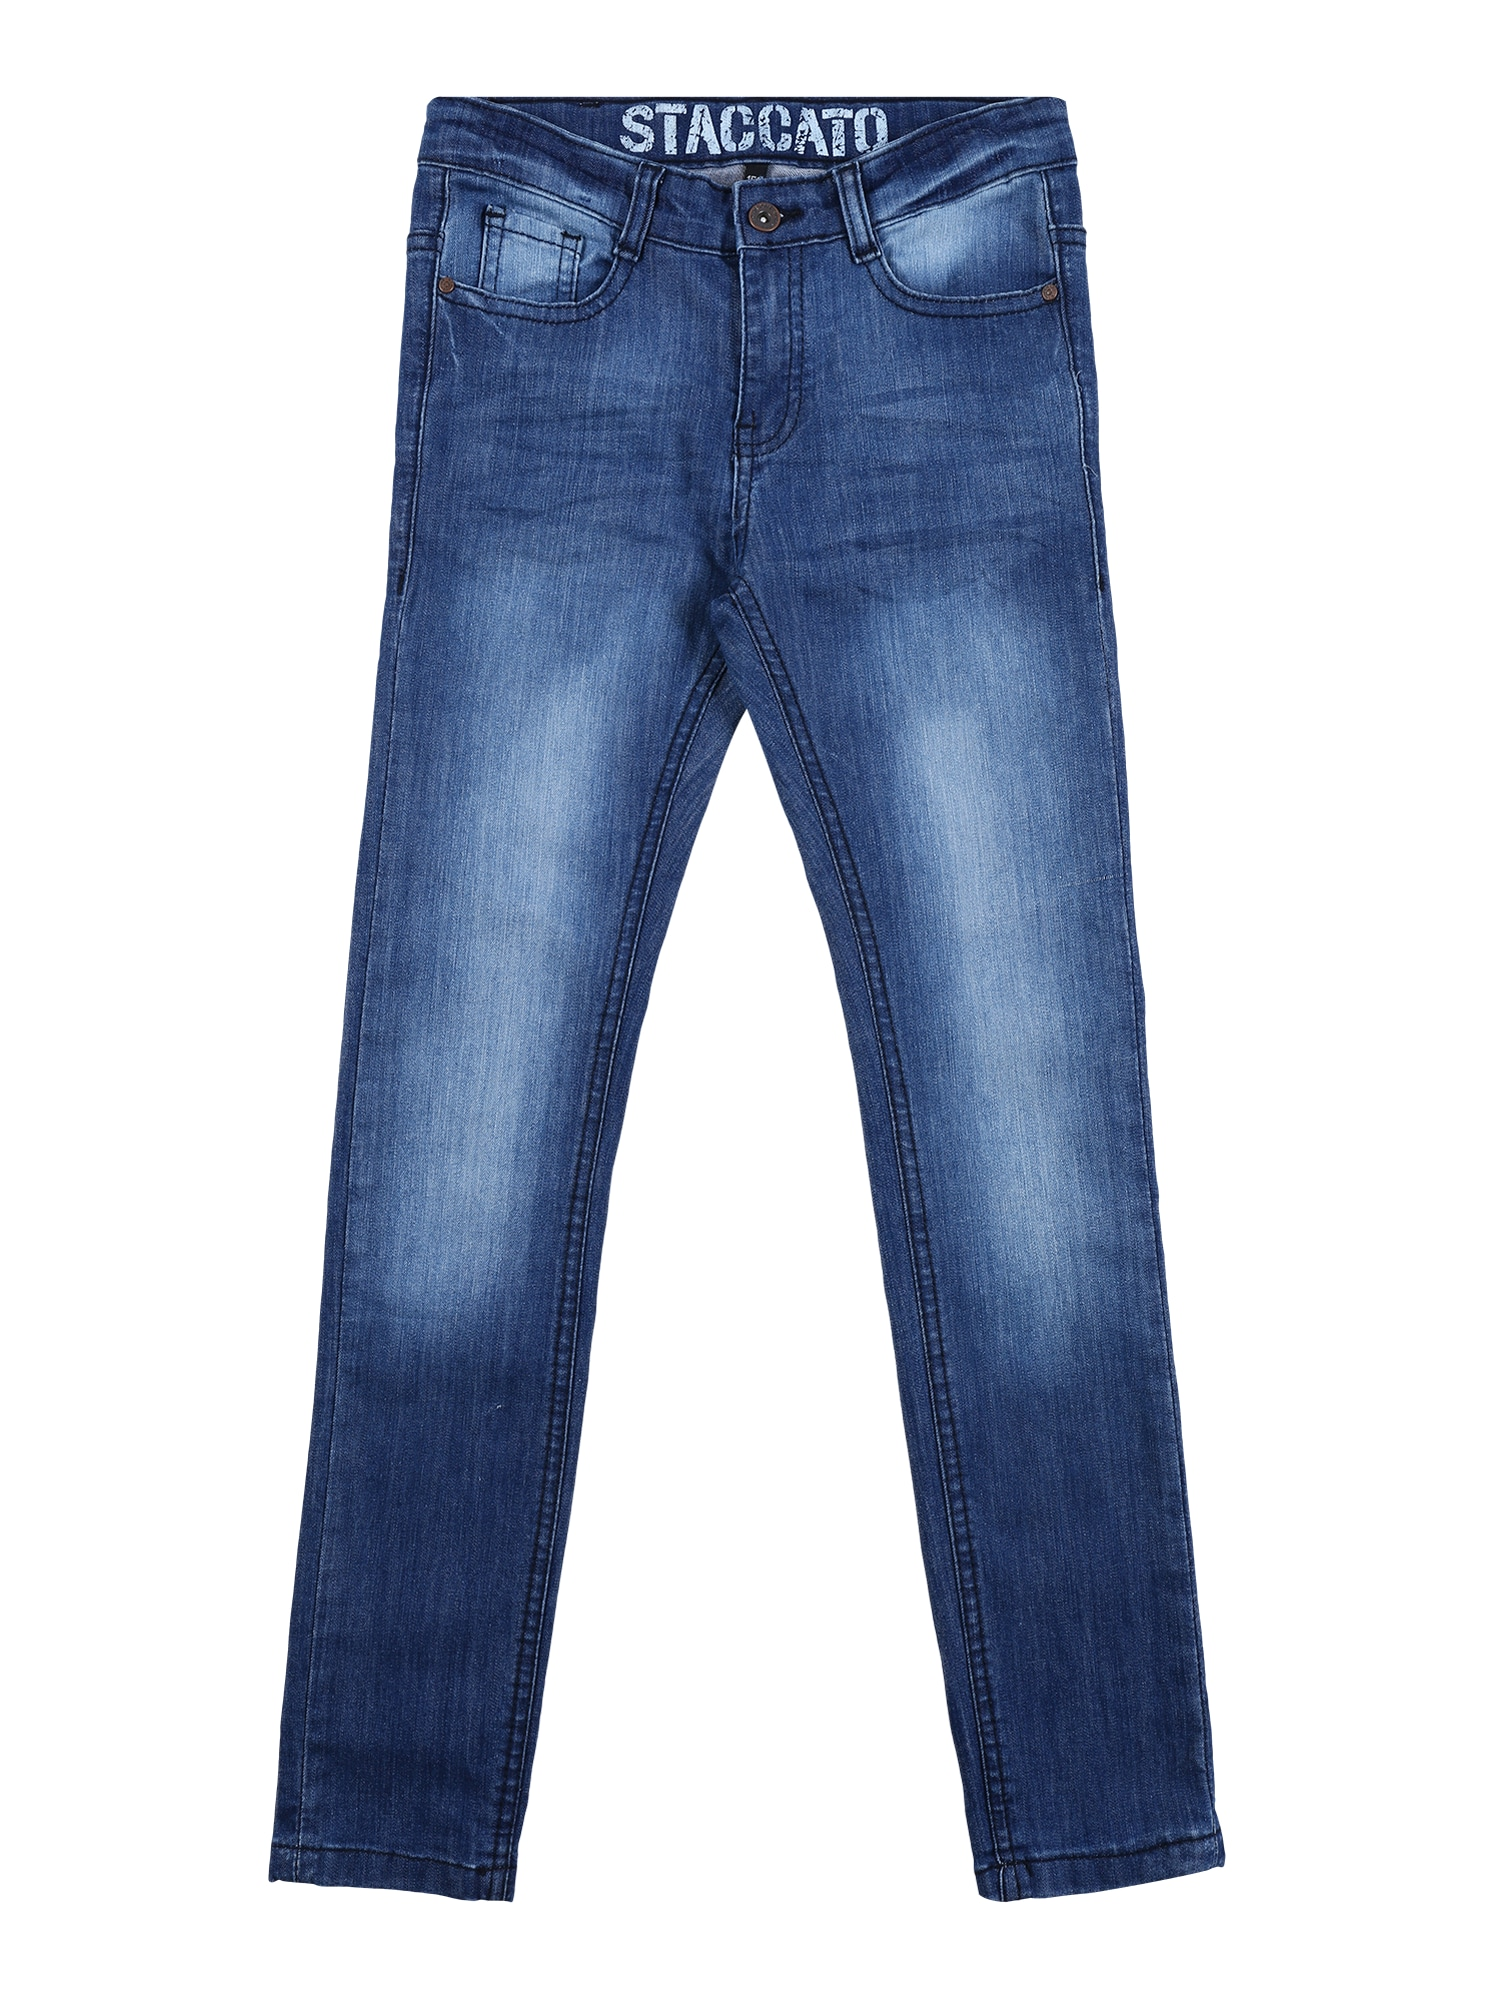 STACCATO Džinsai tamsiai (džinso) mėlyna